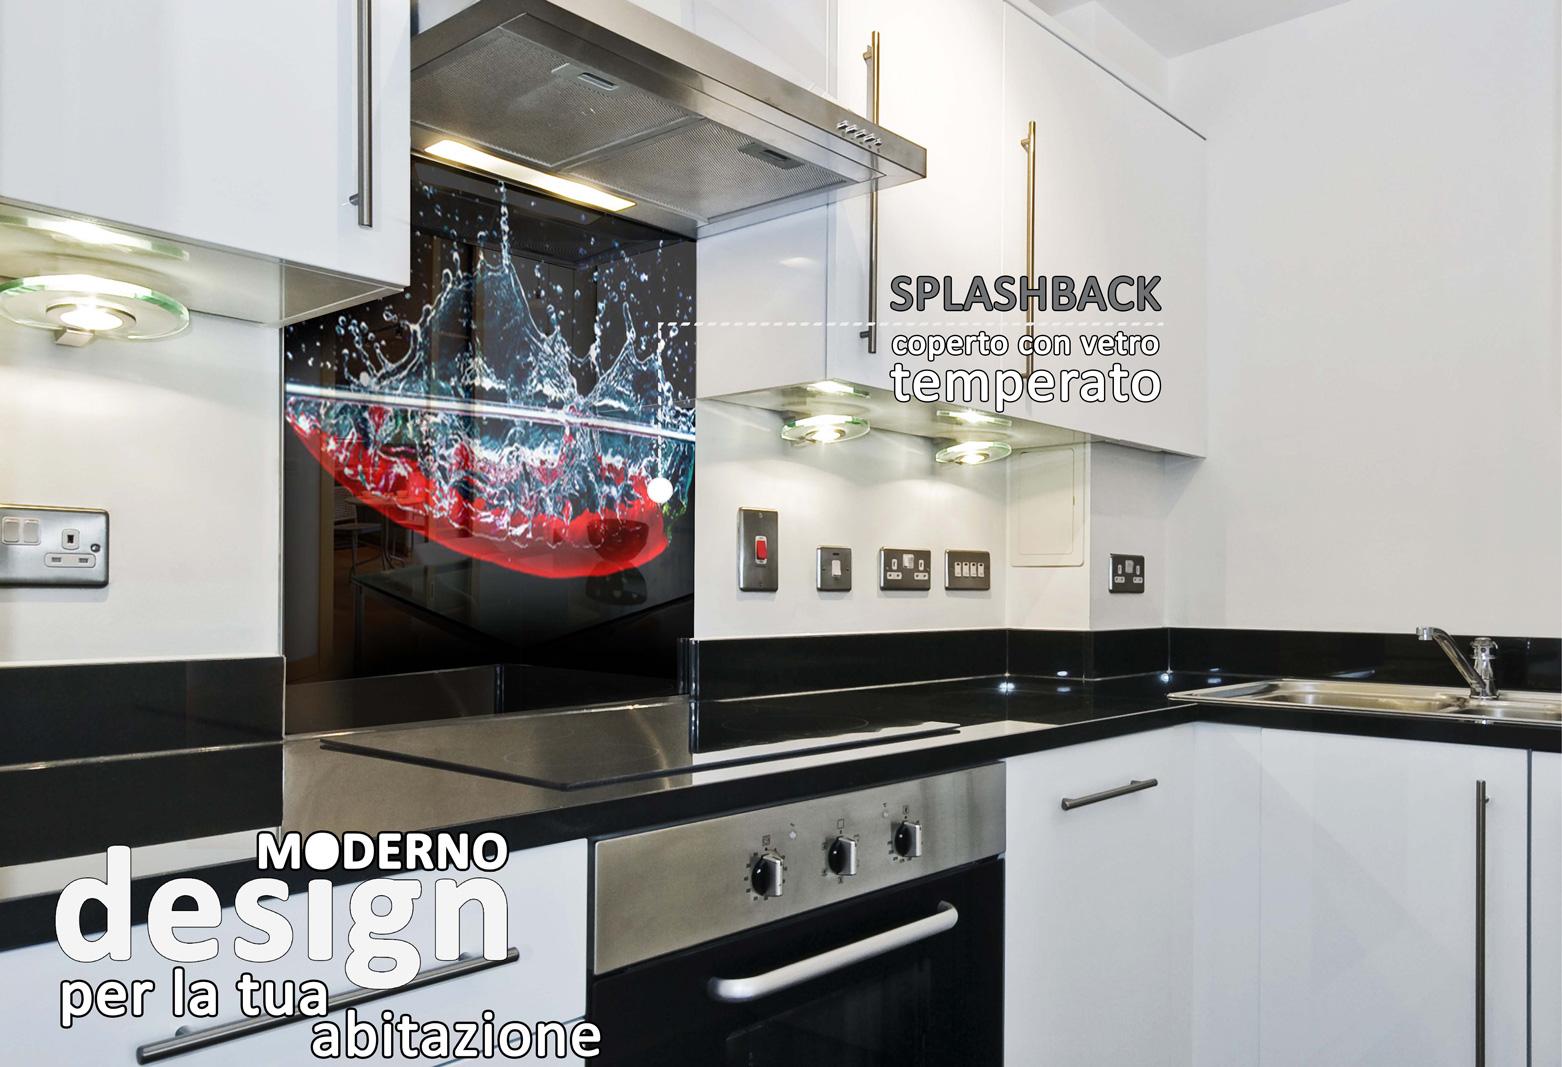 Paraschizzi cucina vetro temperato latest ha anta finale arrotondata la parete vasca aurora - Schienale cucina in vetro temperato ...